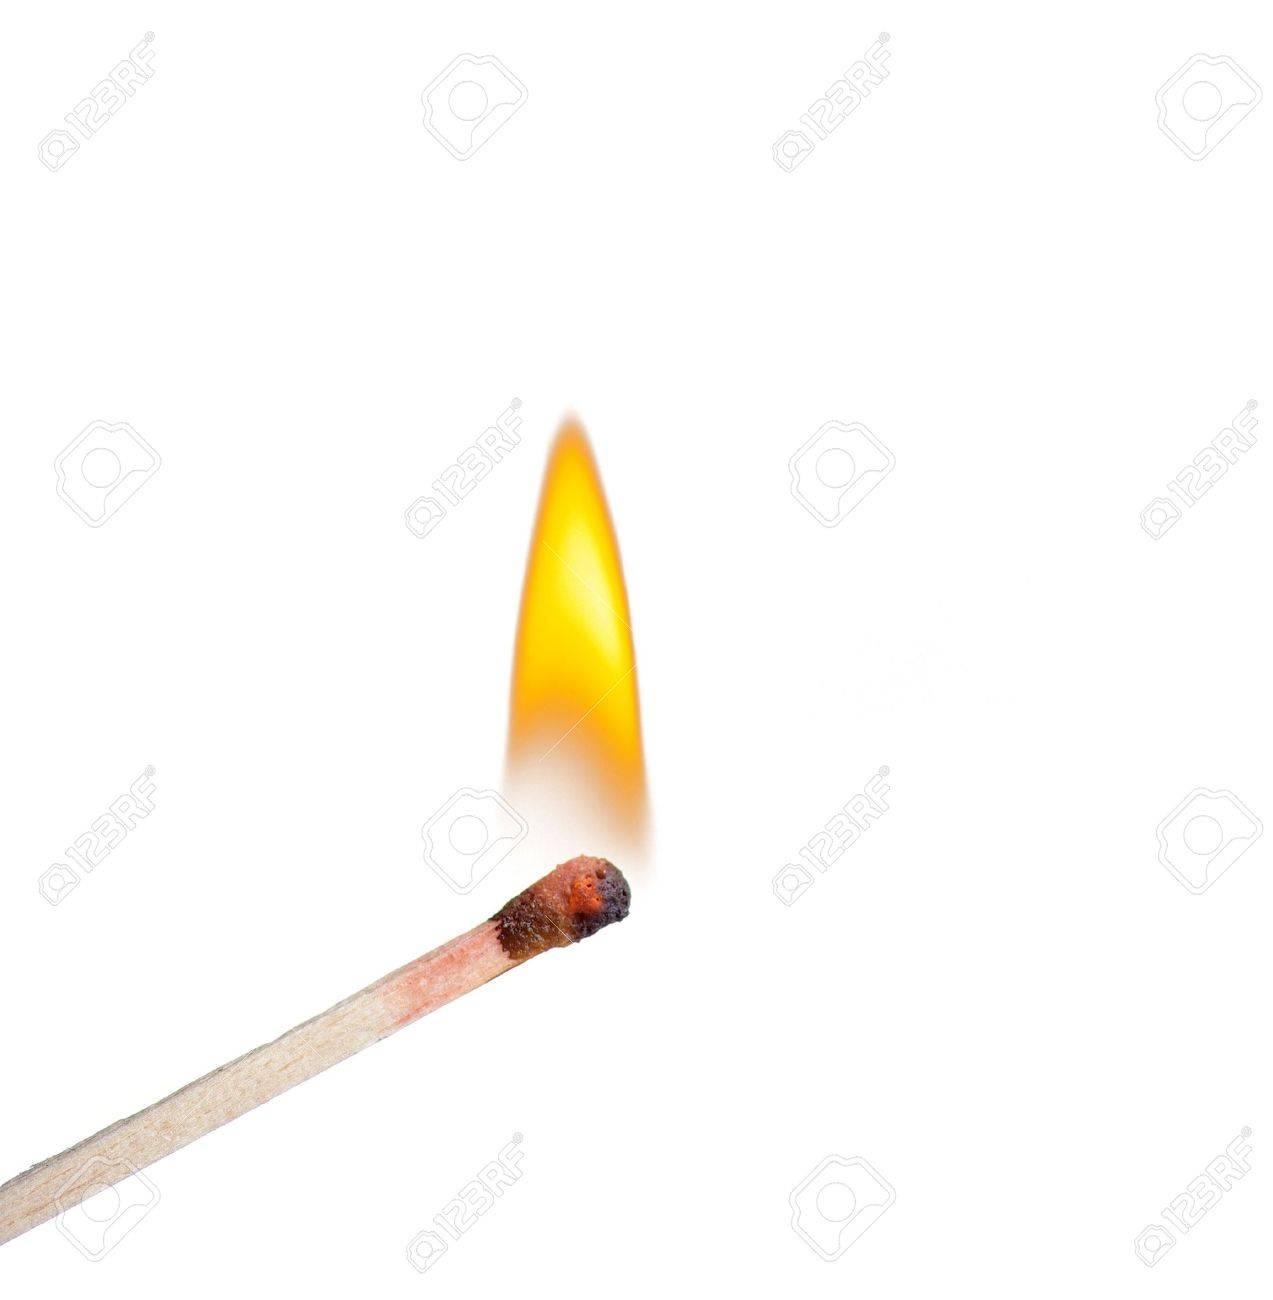 burning match on a